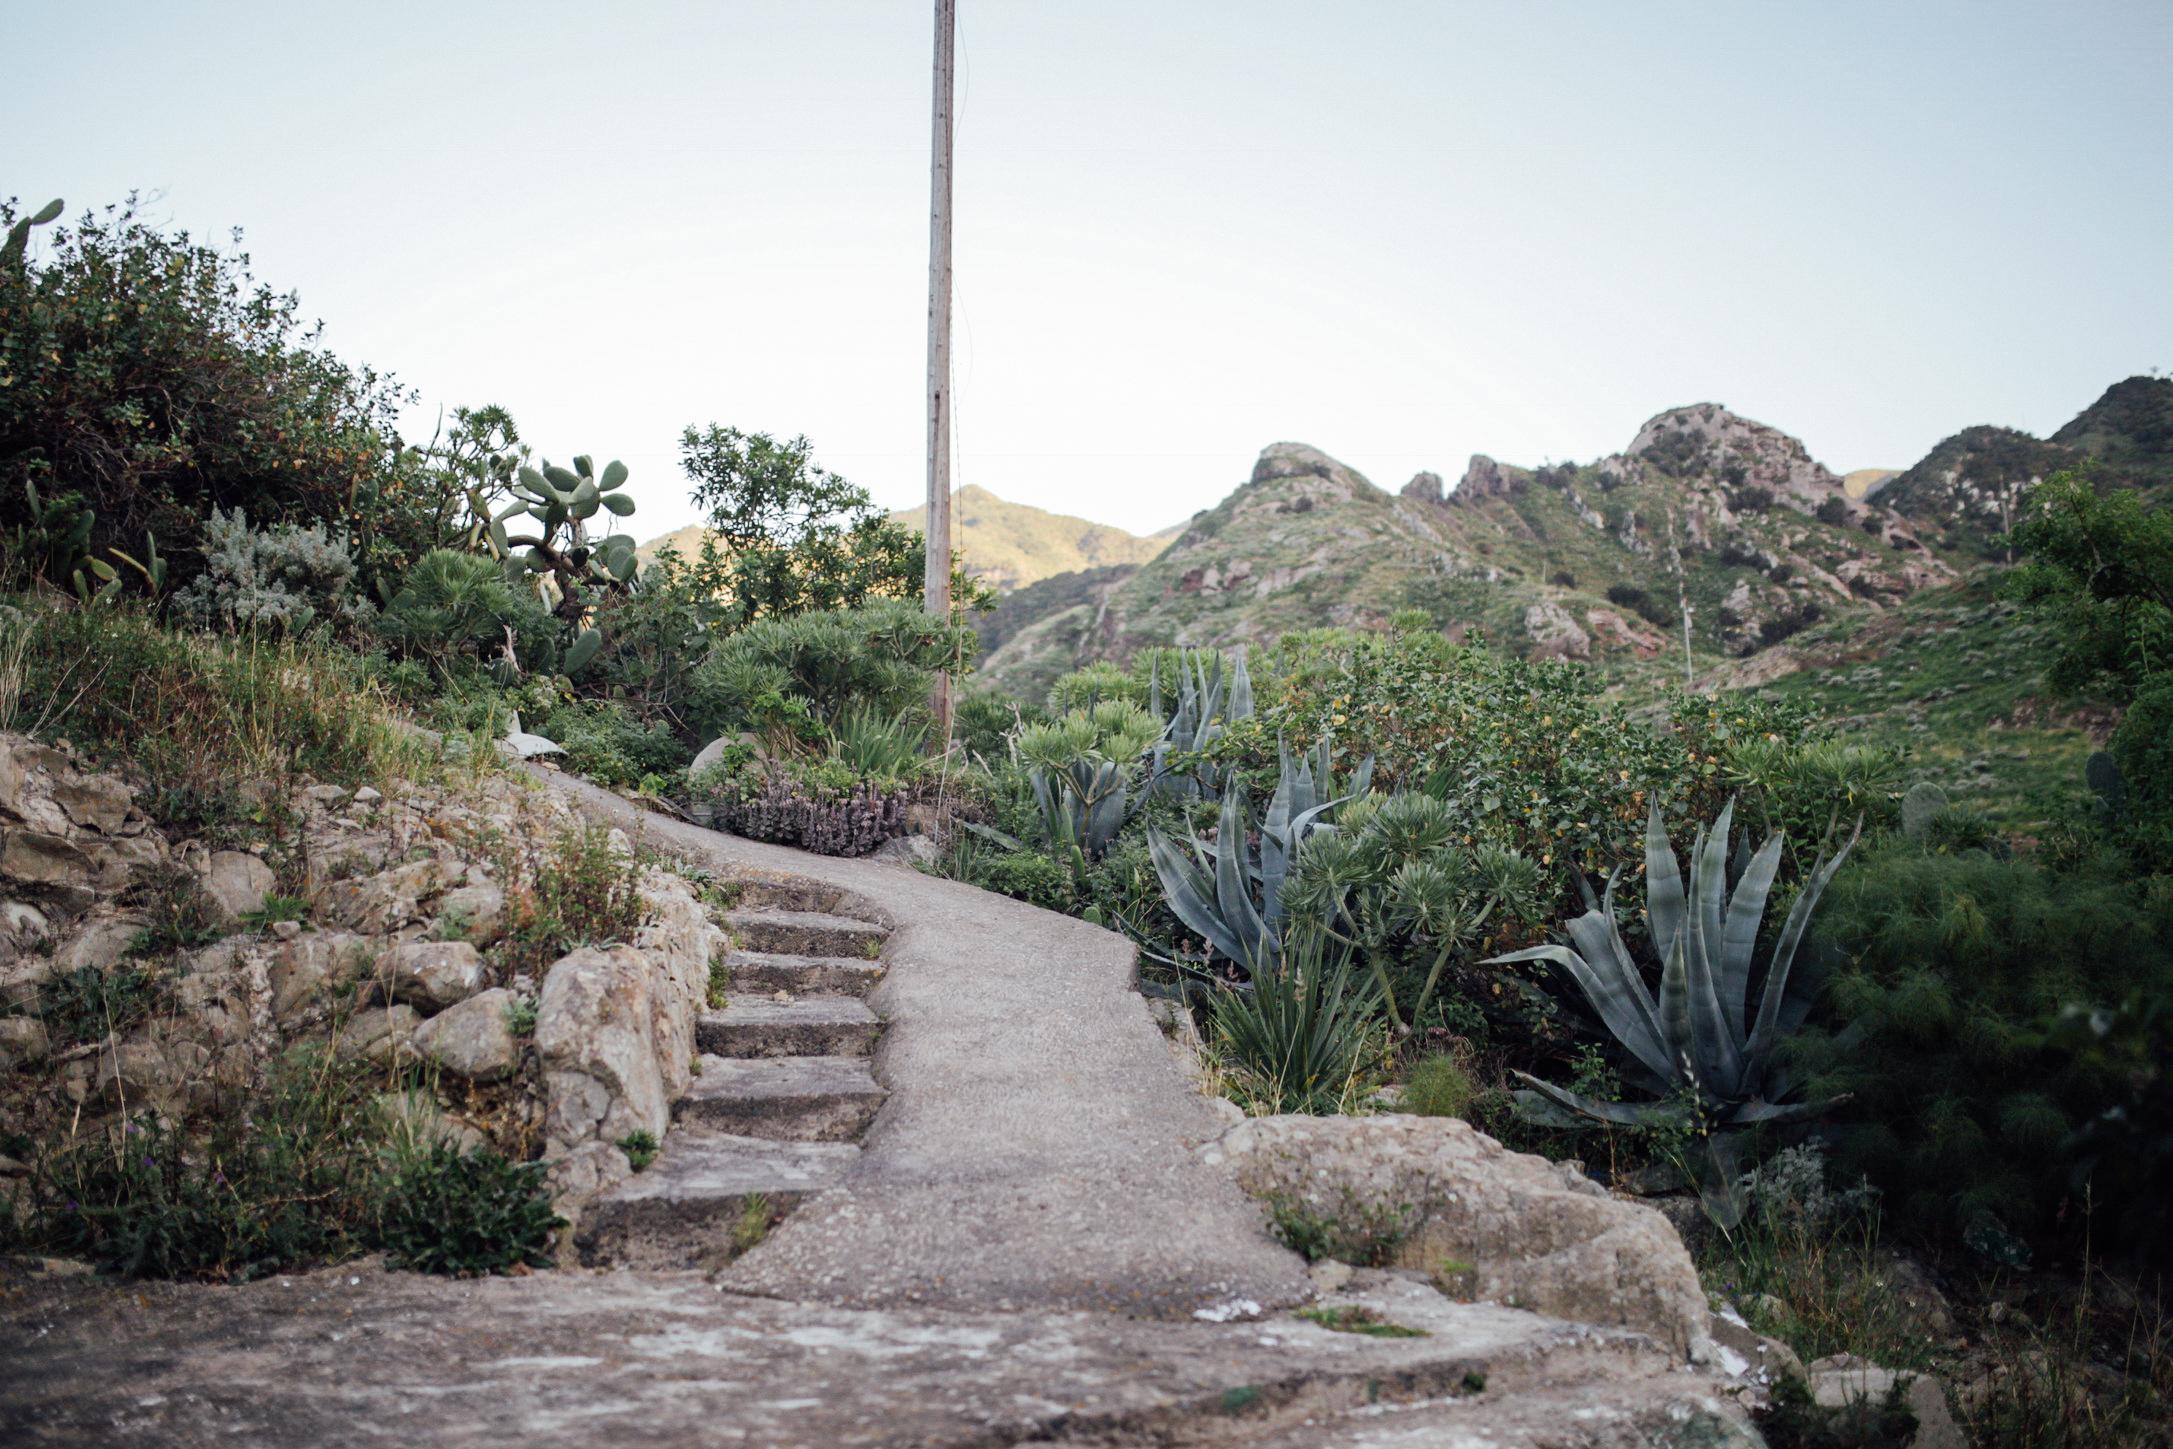 Algunas plantas típicas del paisaje de Anaga // Some typical plants of Anaga's landscape